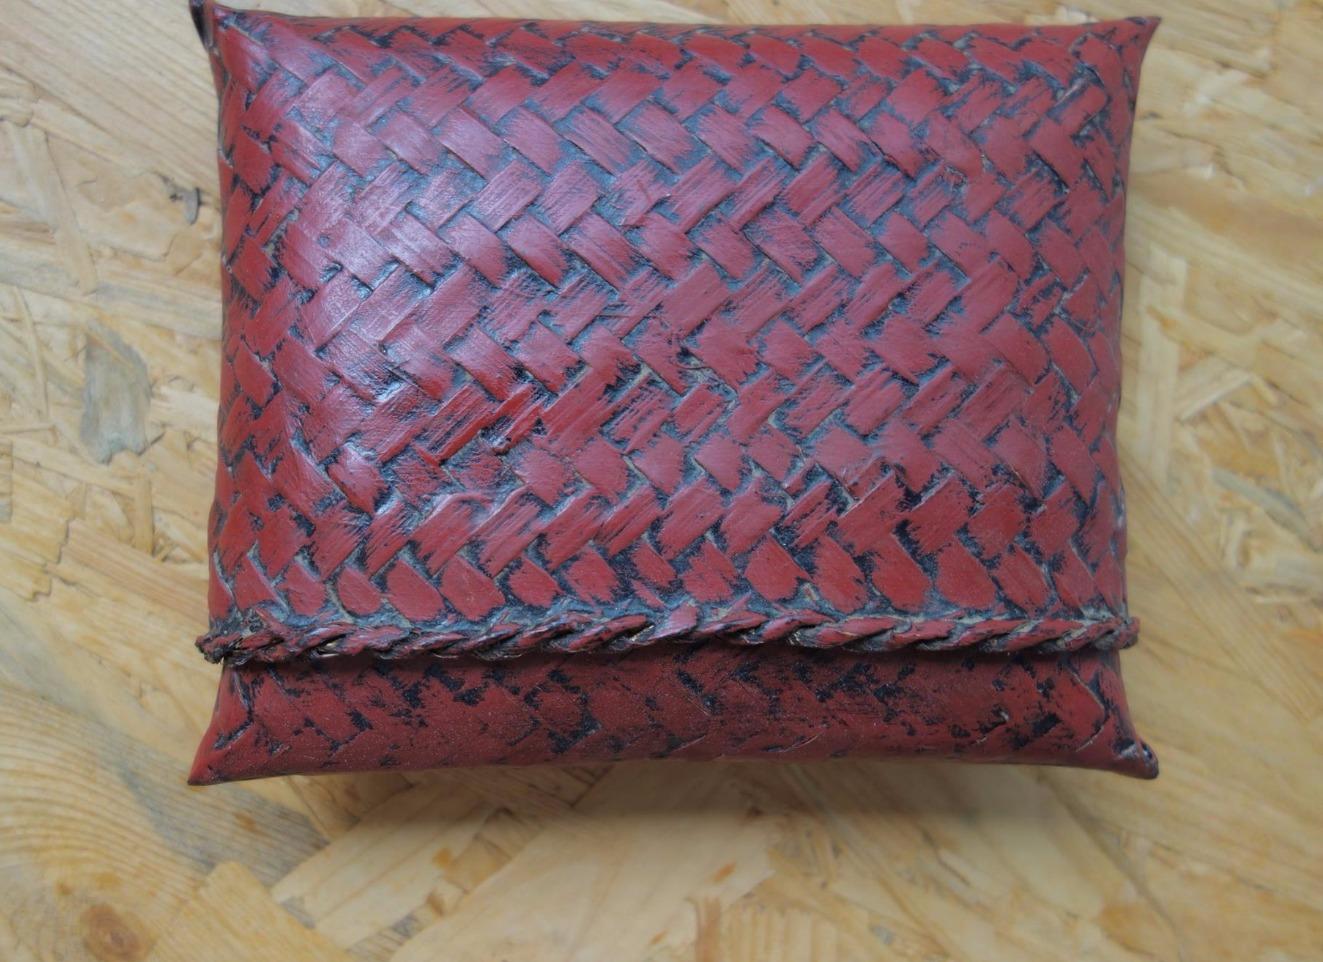 Lacquer Clutch Bag